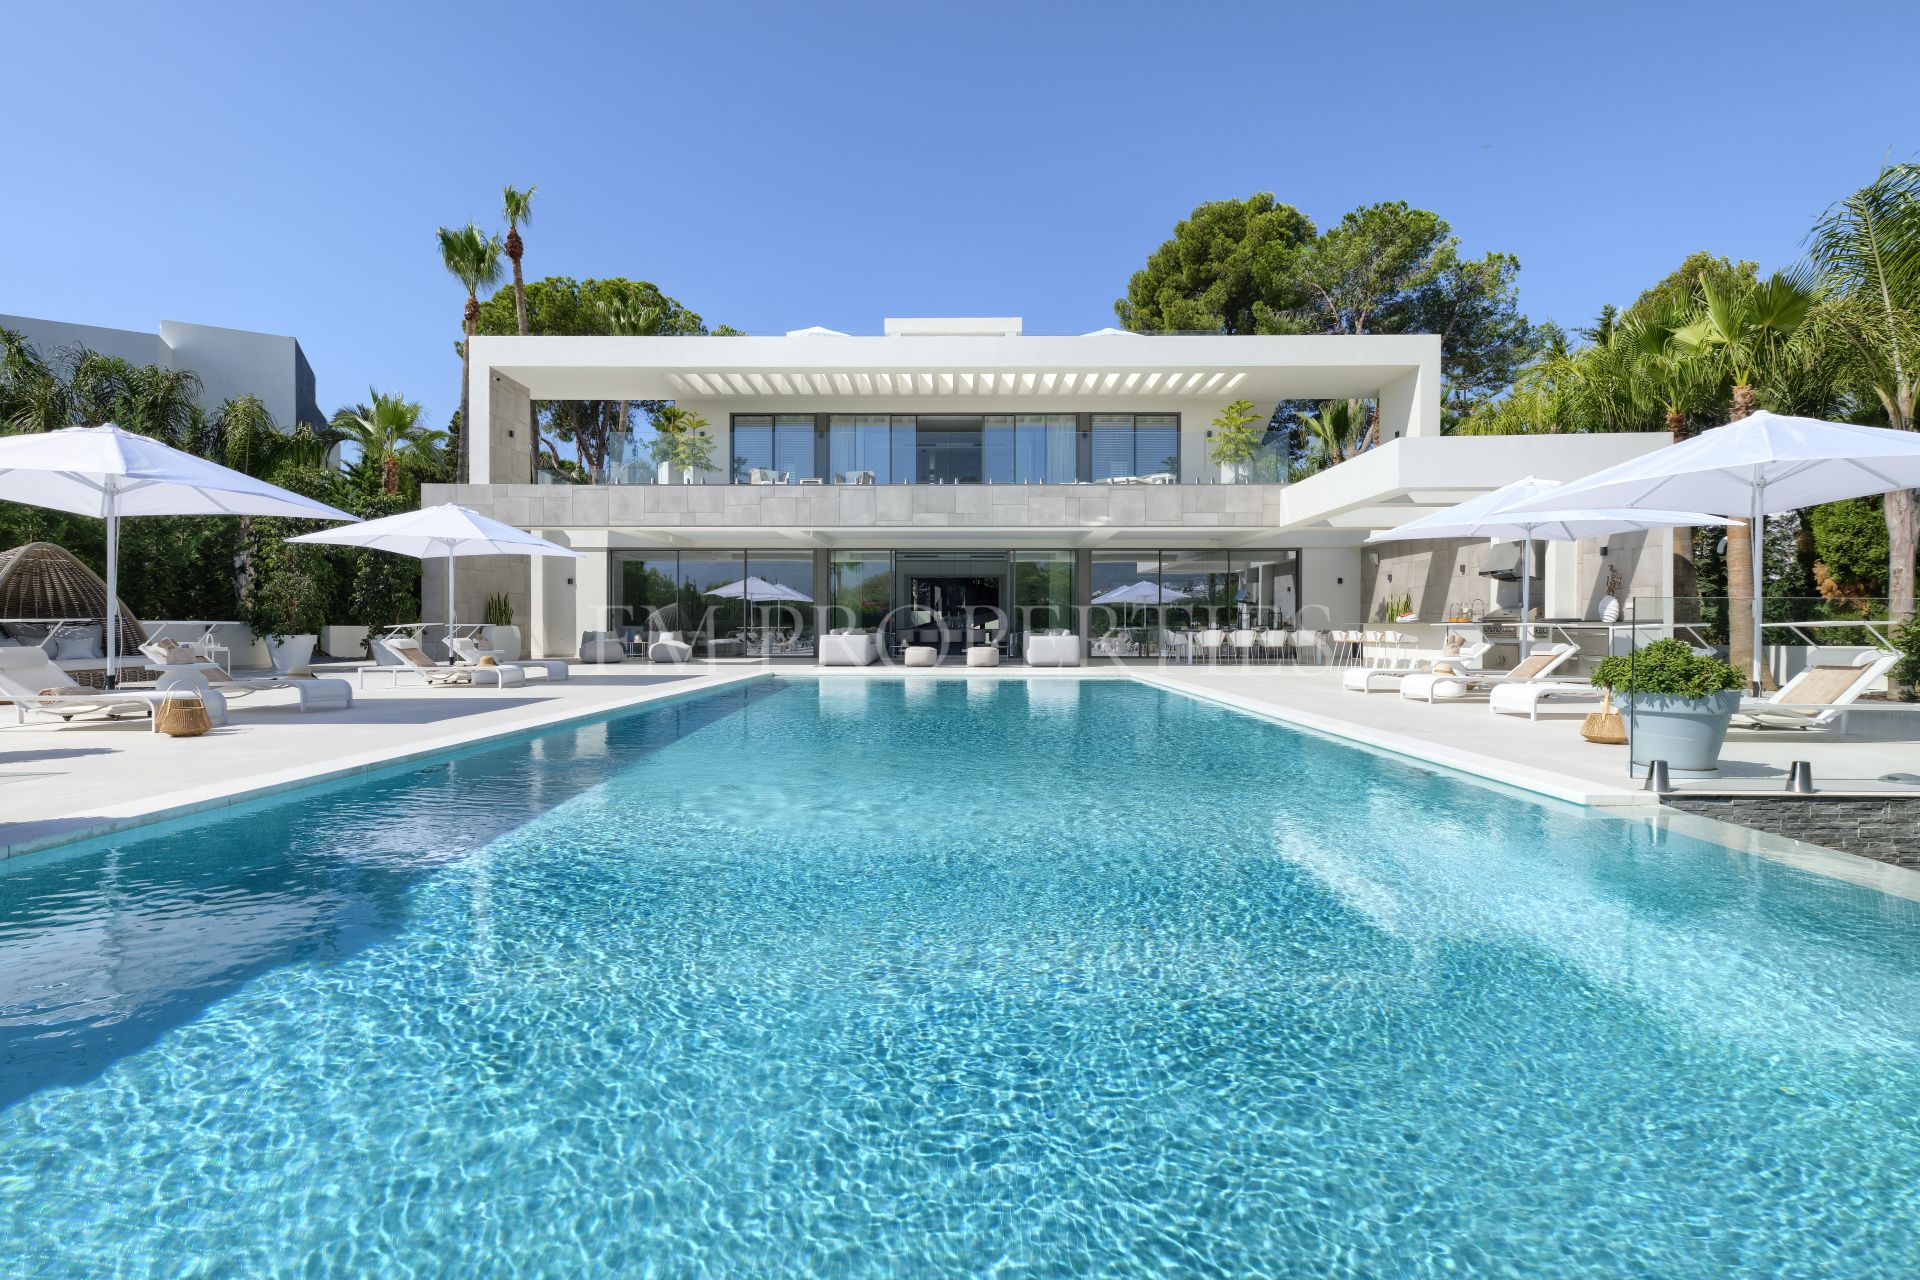 Villa zu verkaufen in Nueva Andalucia, Marbella